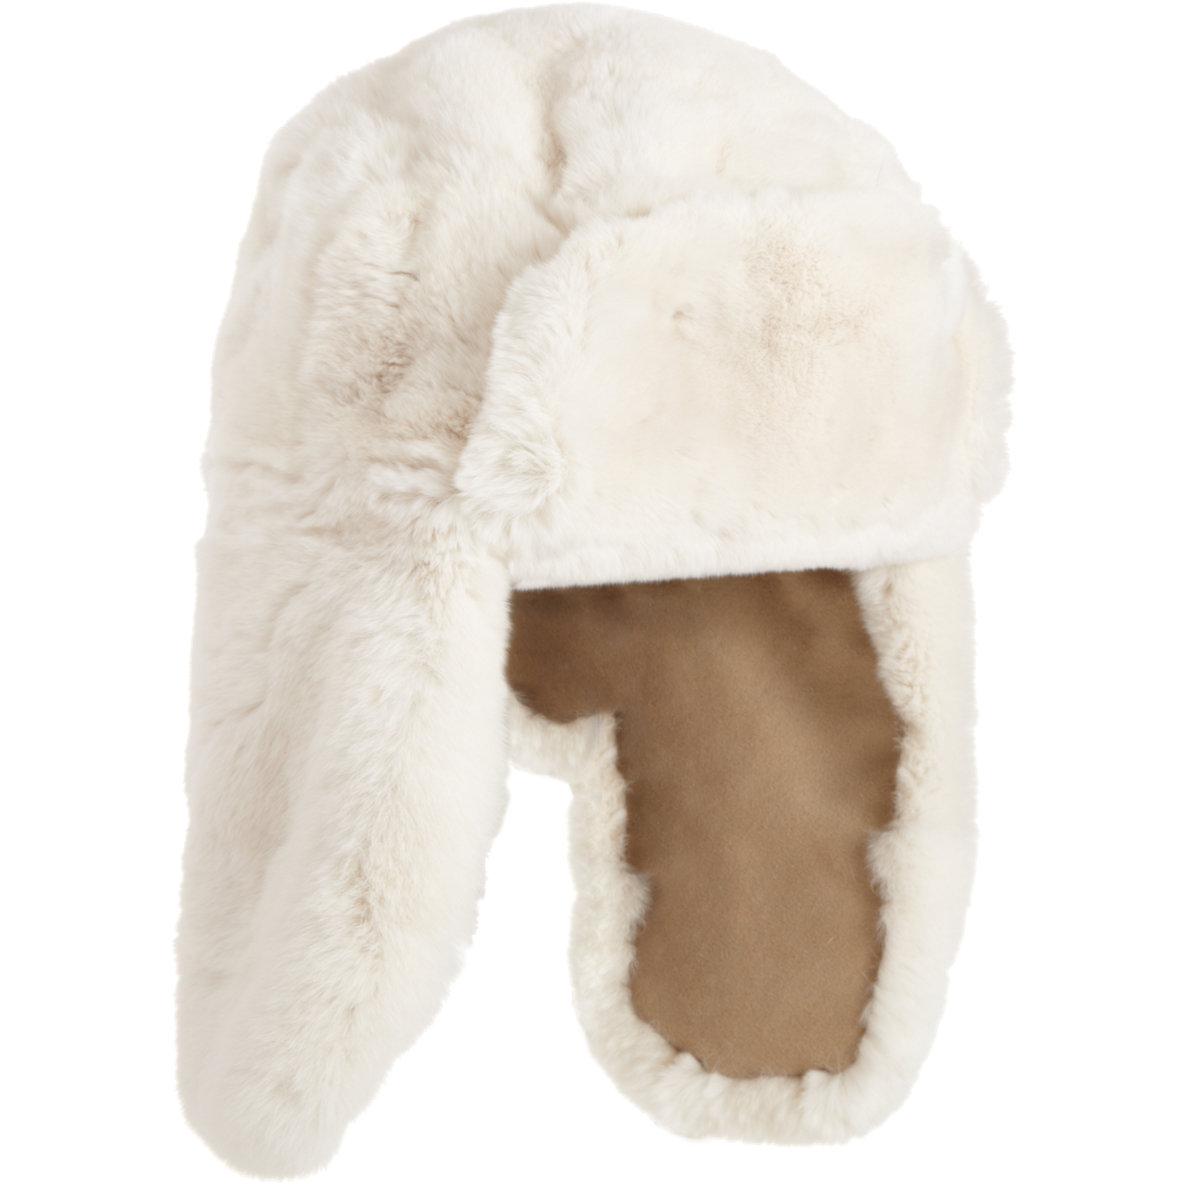 BARNEYS NEW YORK Reversible Rabbit Fur Trapper Hat  $319 Sale